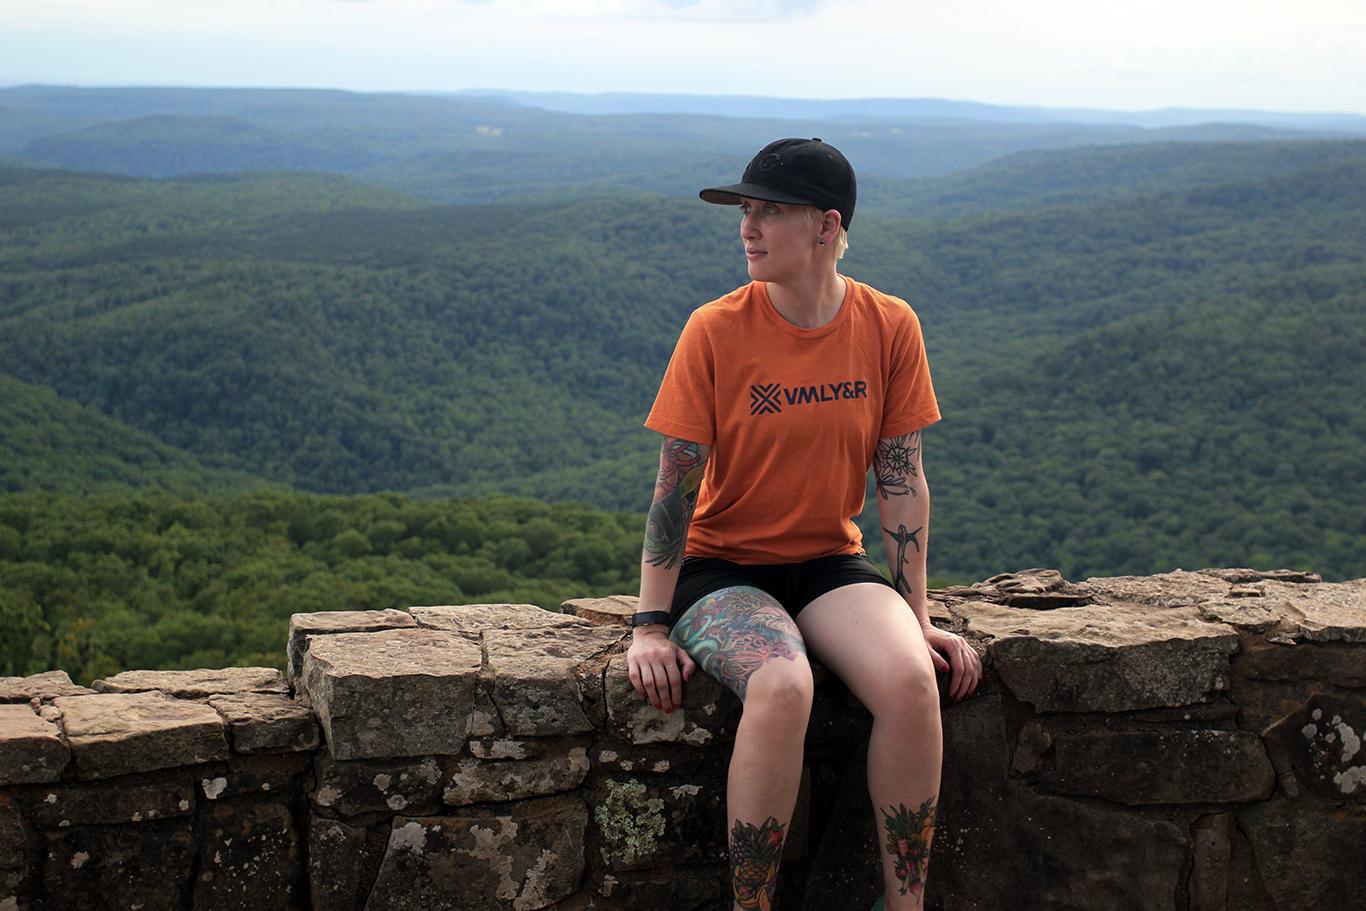 Summer Camping at White Rock Mountain, Arkansas